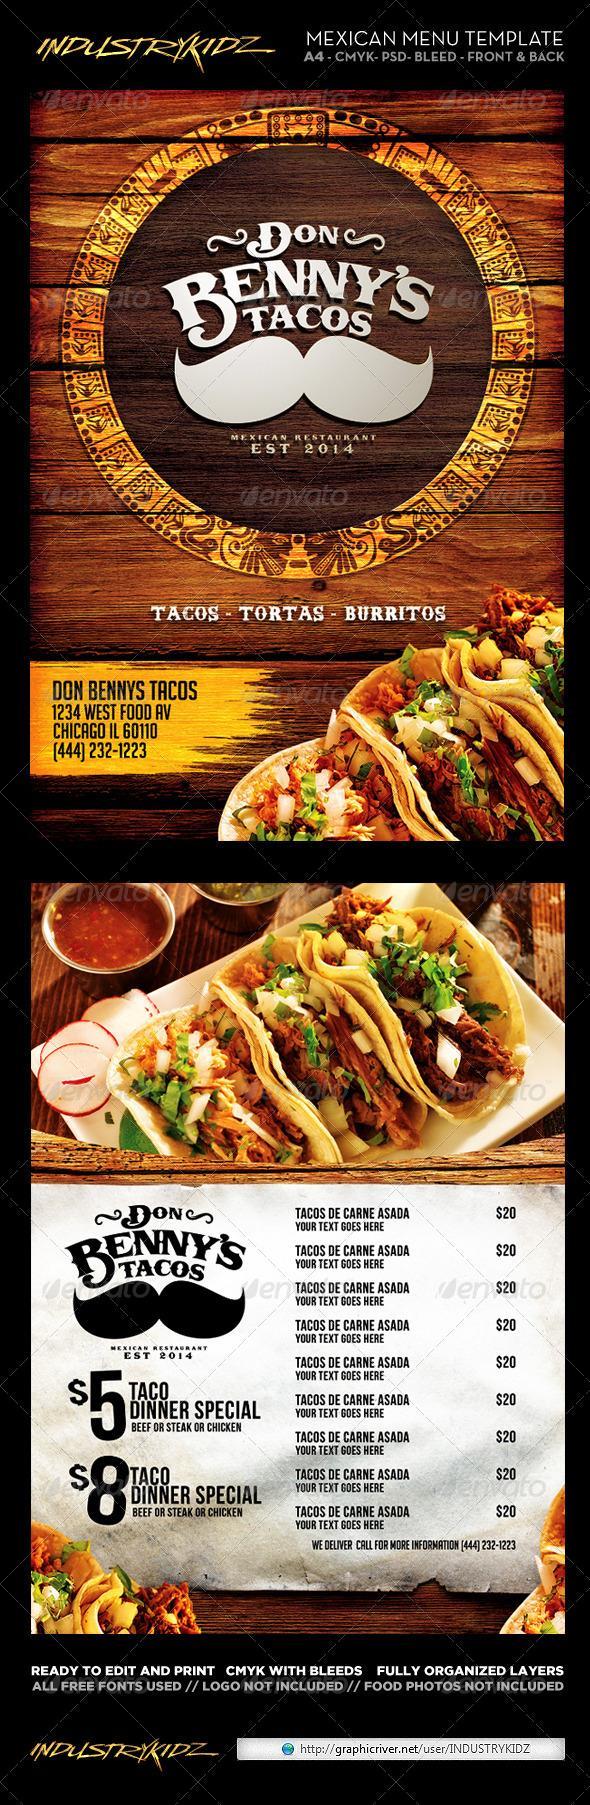 mexican menu template restaurant menu pinterest menu template